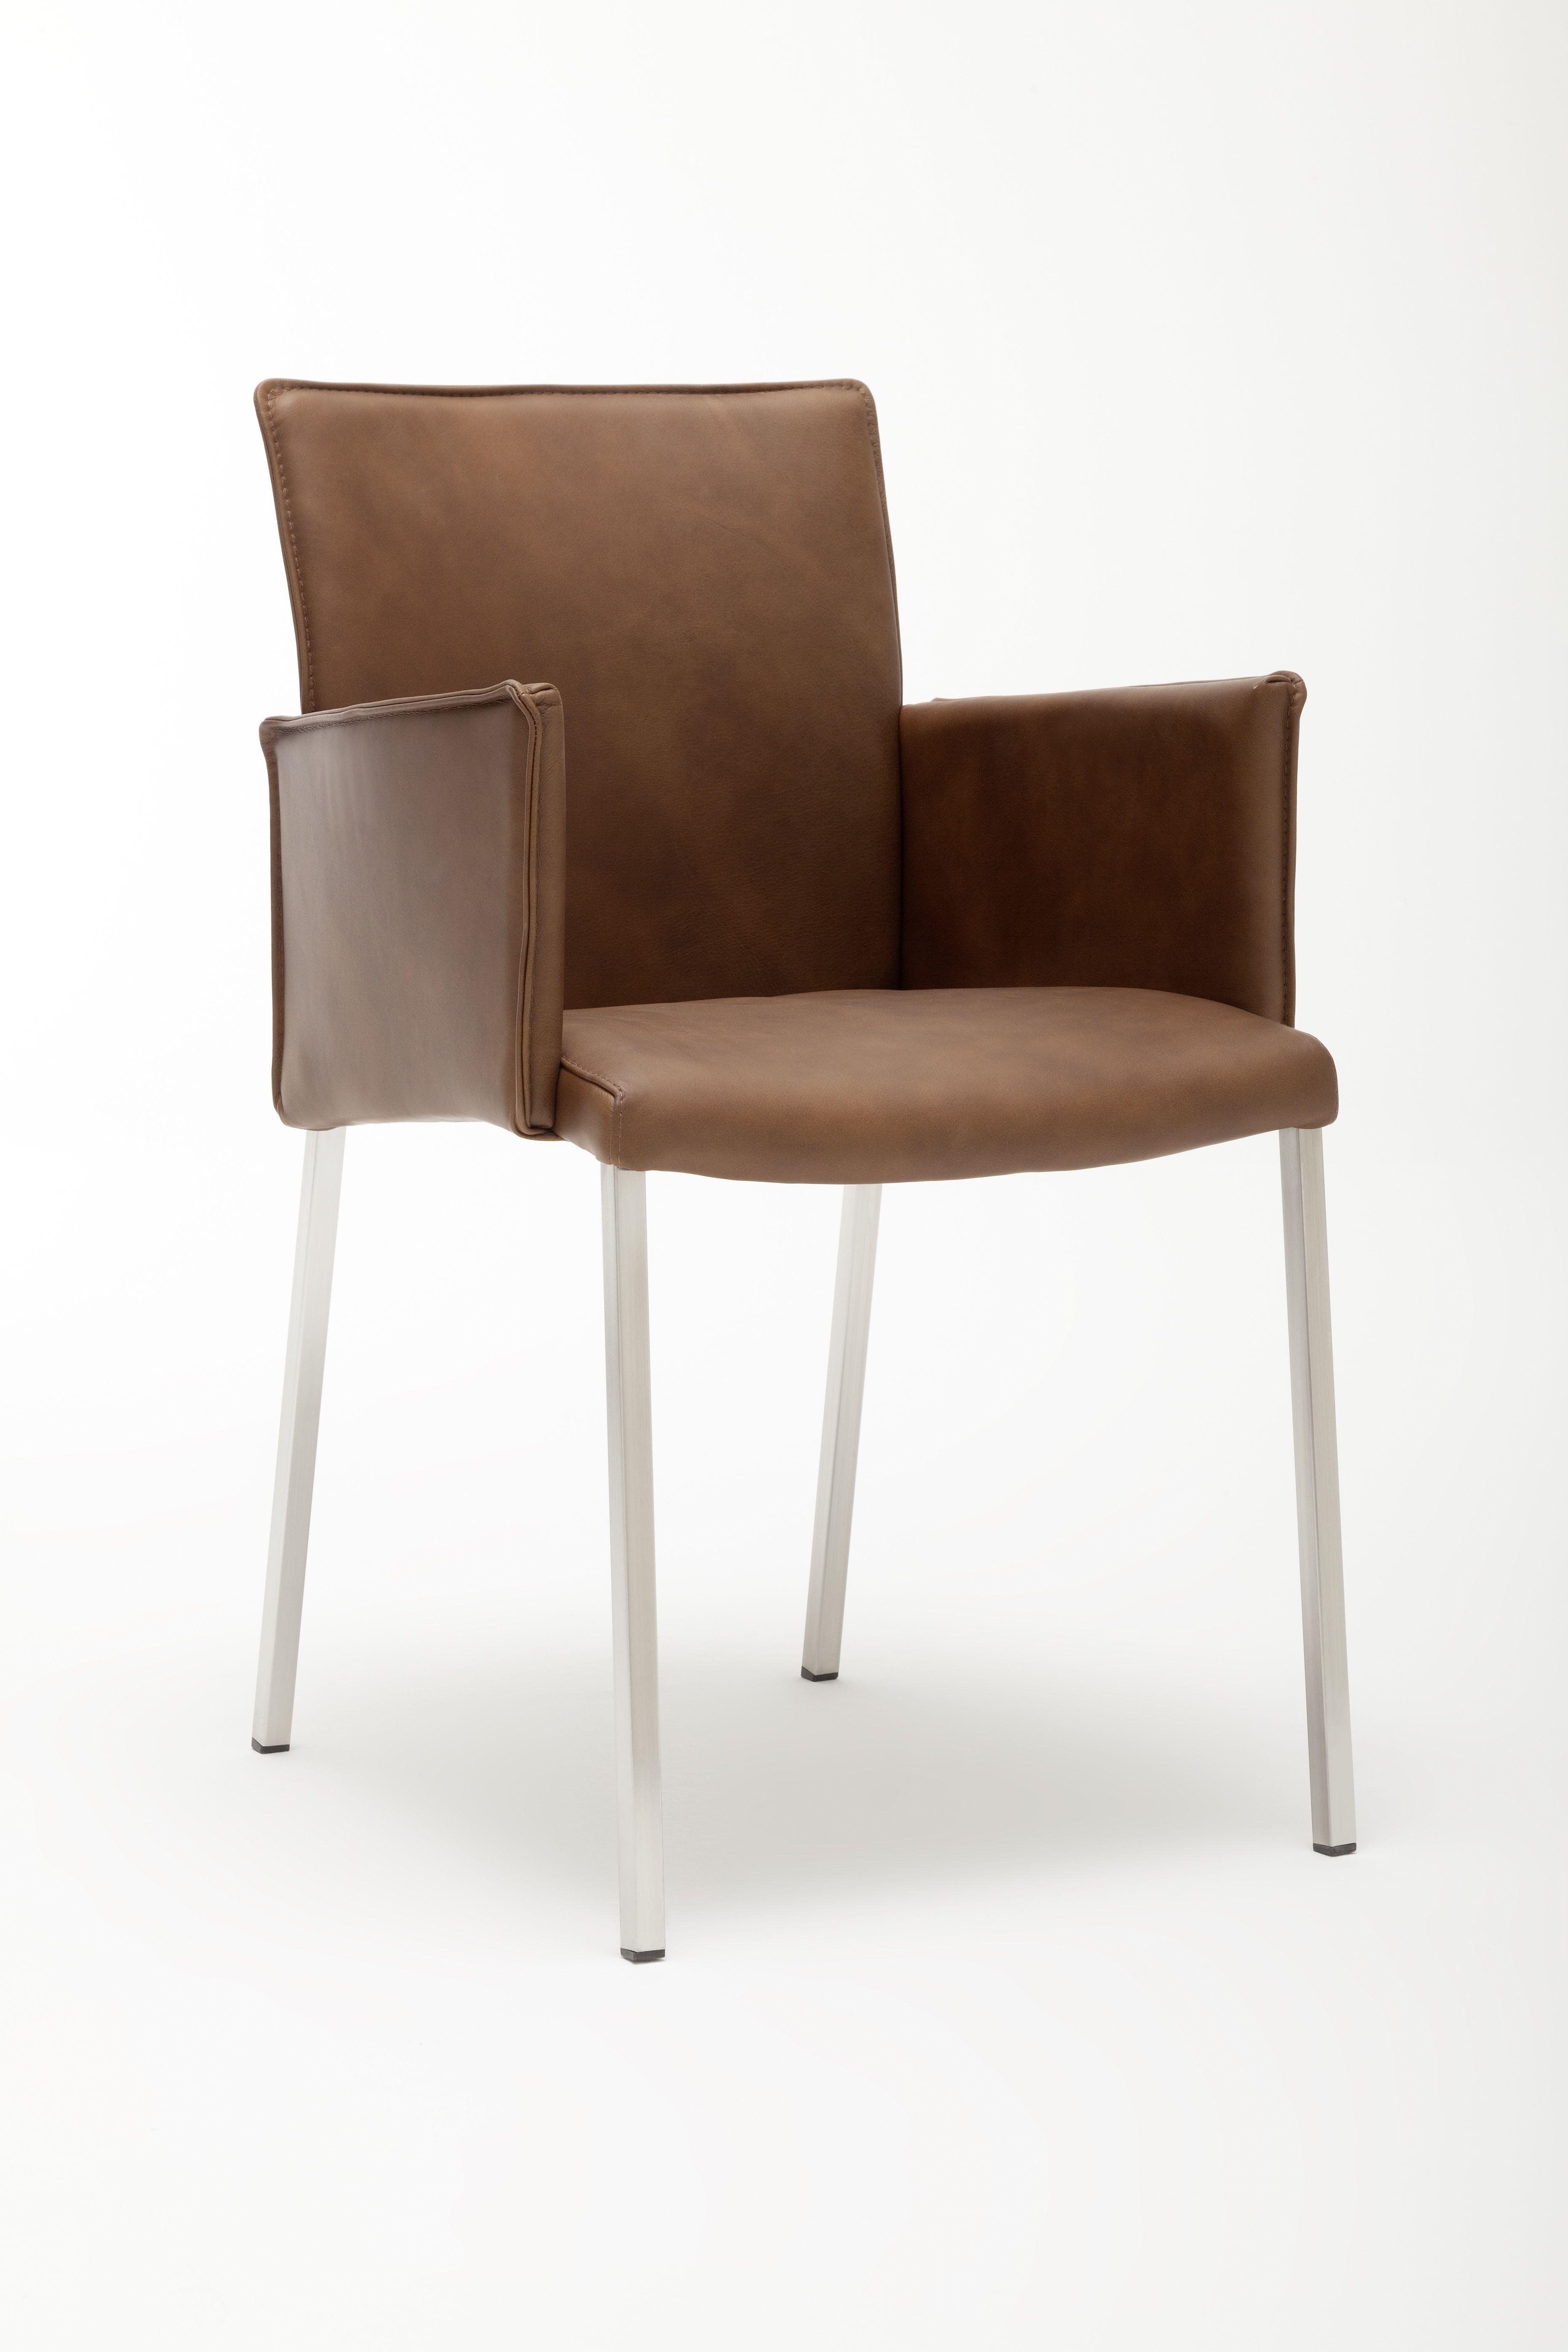 Attractive Stuhl Esszimmer Leder Photo Of Vierfuß-stuhl Jule #gwinner#esszimmer#stühle#leder#dinningroom#design